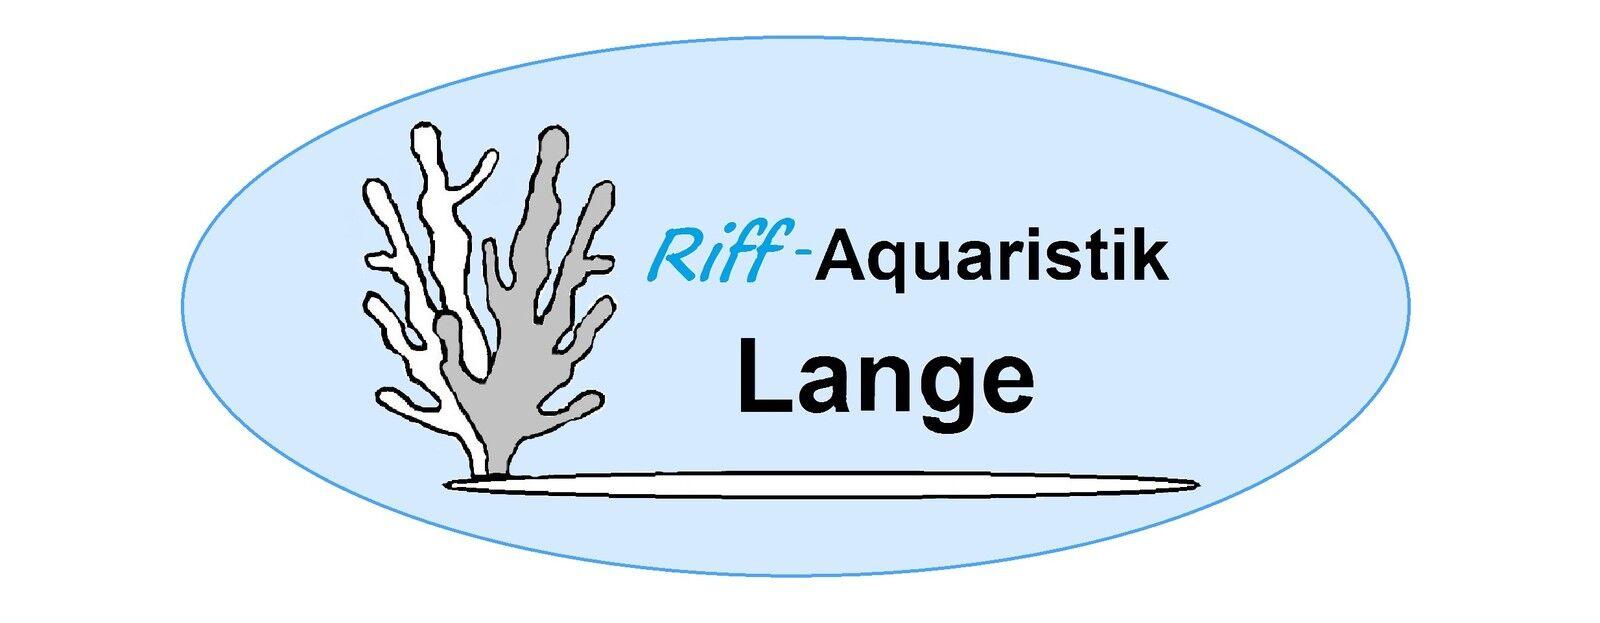 Riff_Aquaristik_lLange